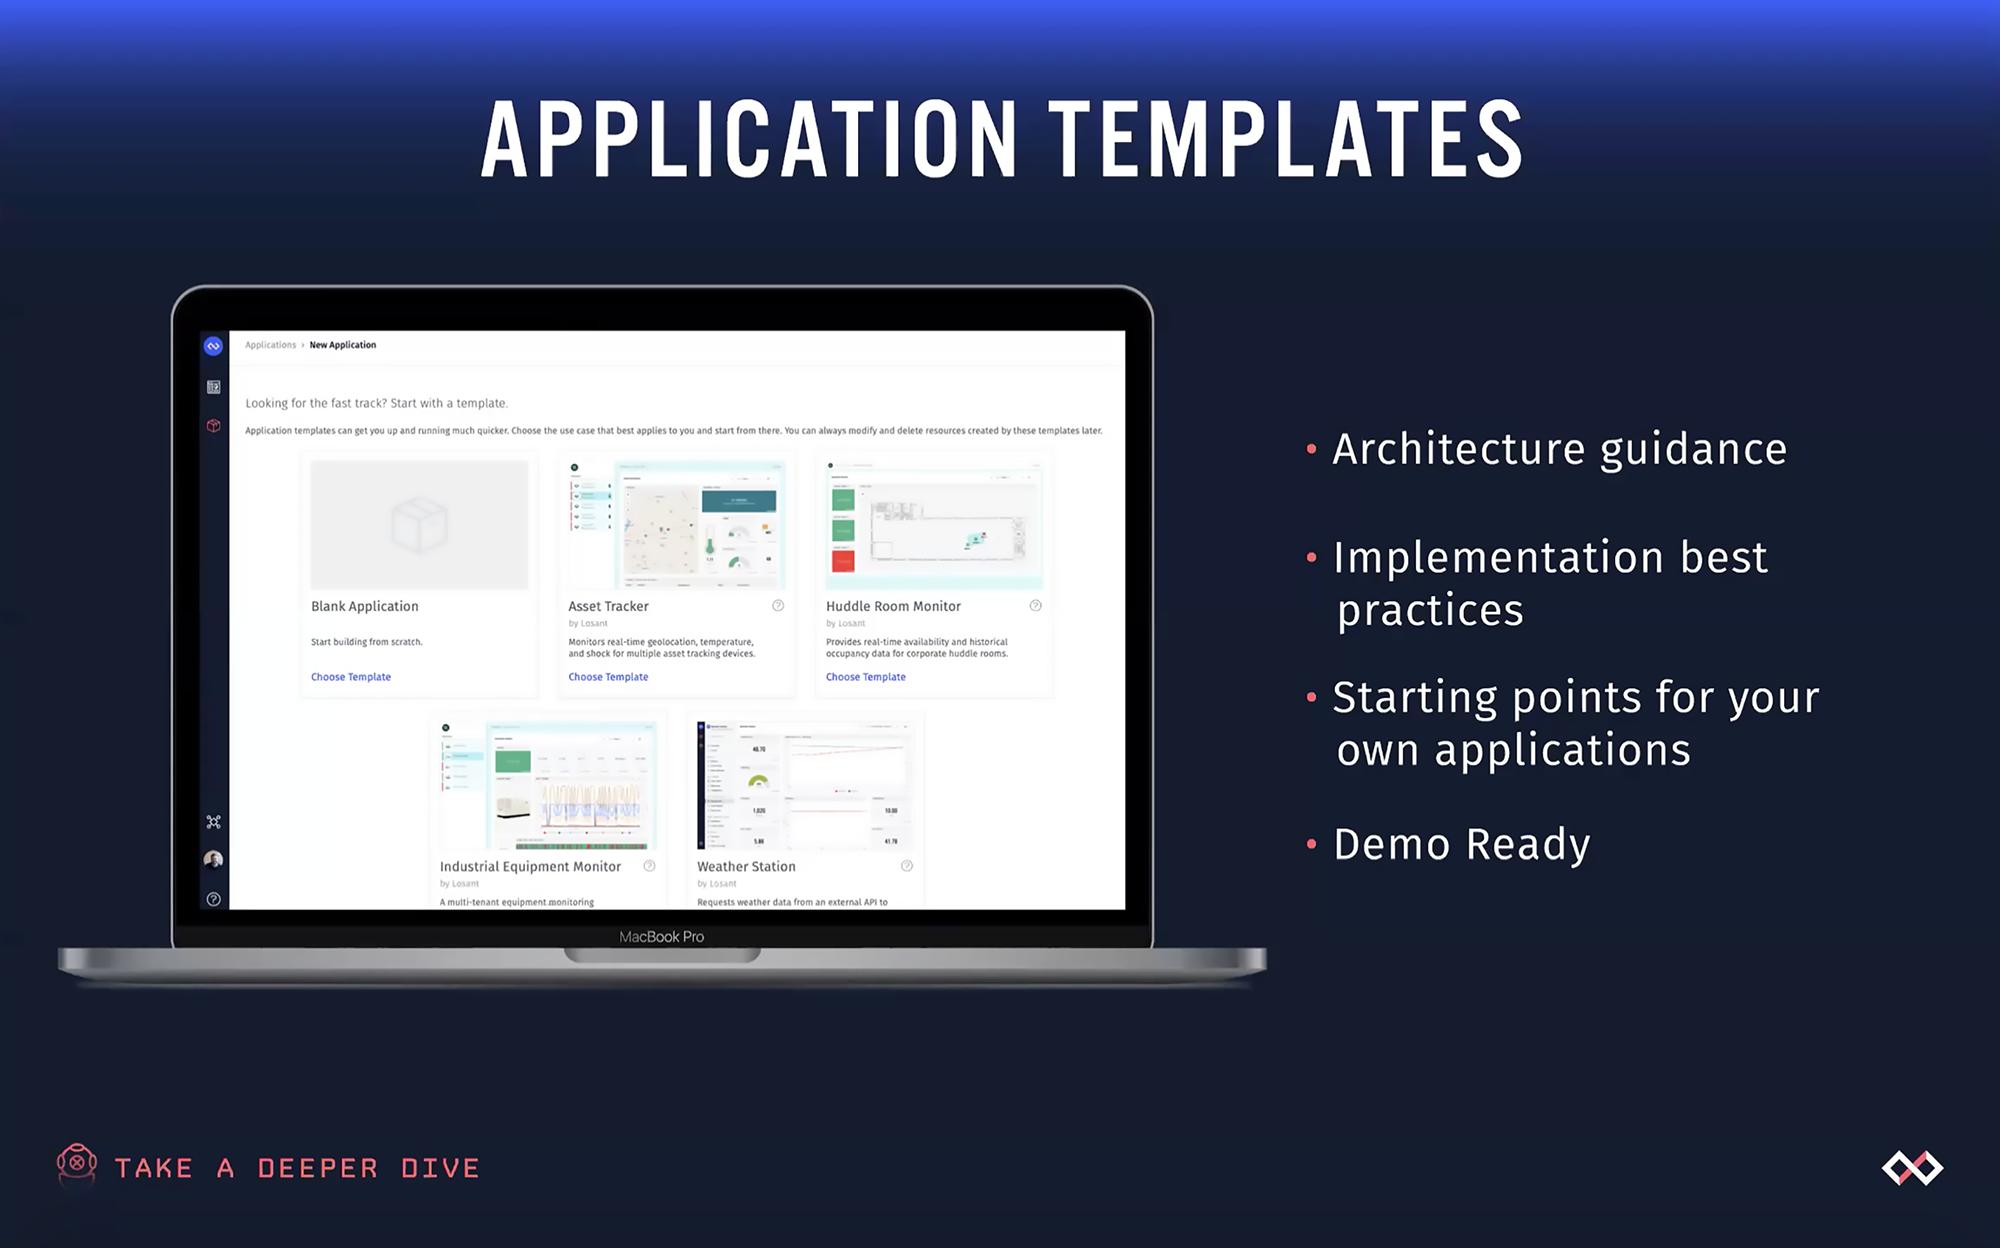 IEM Application Template Deeper Dive